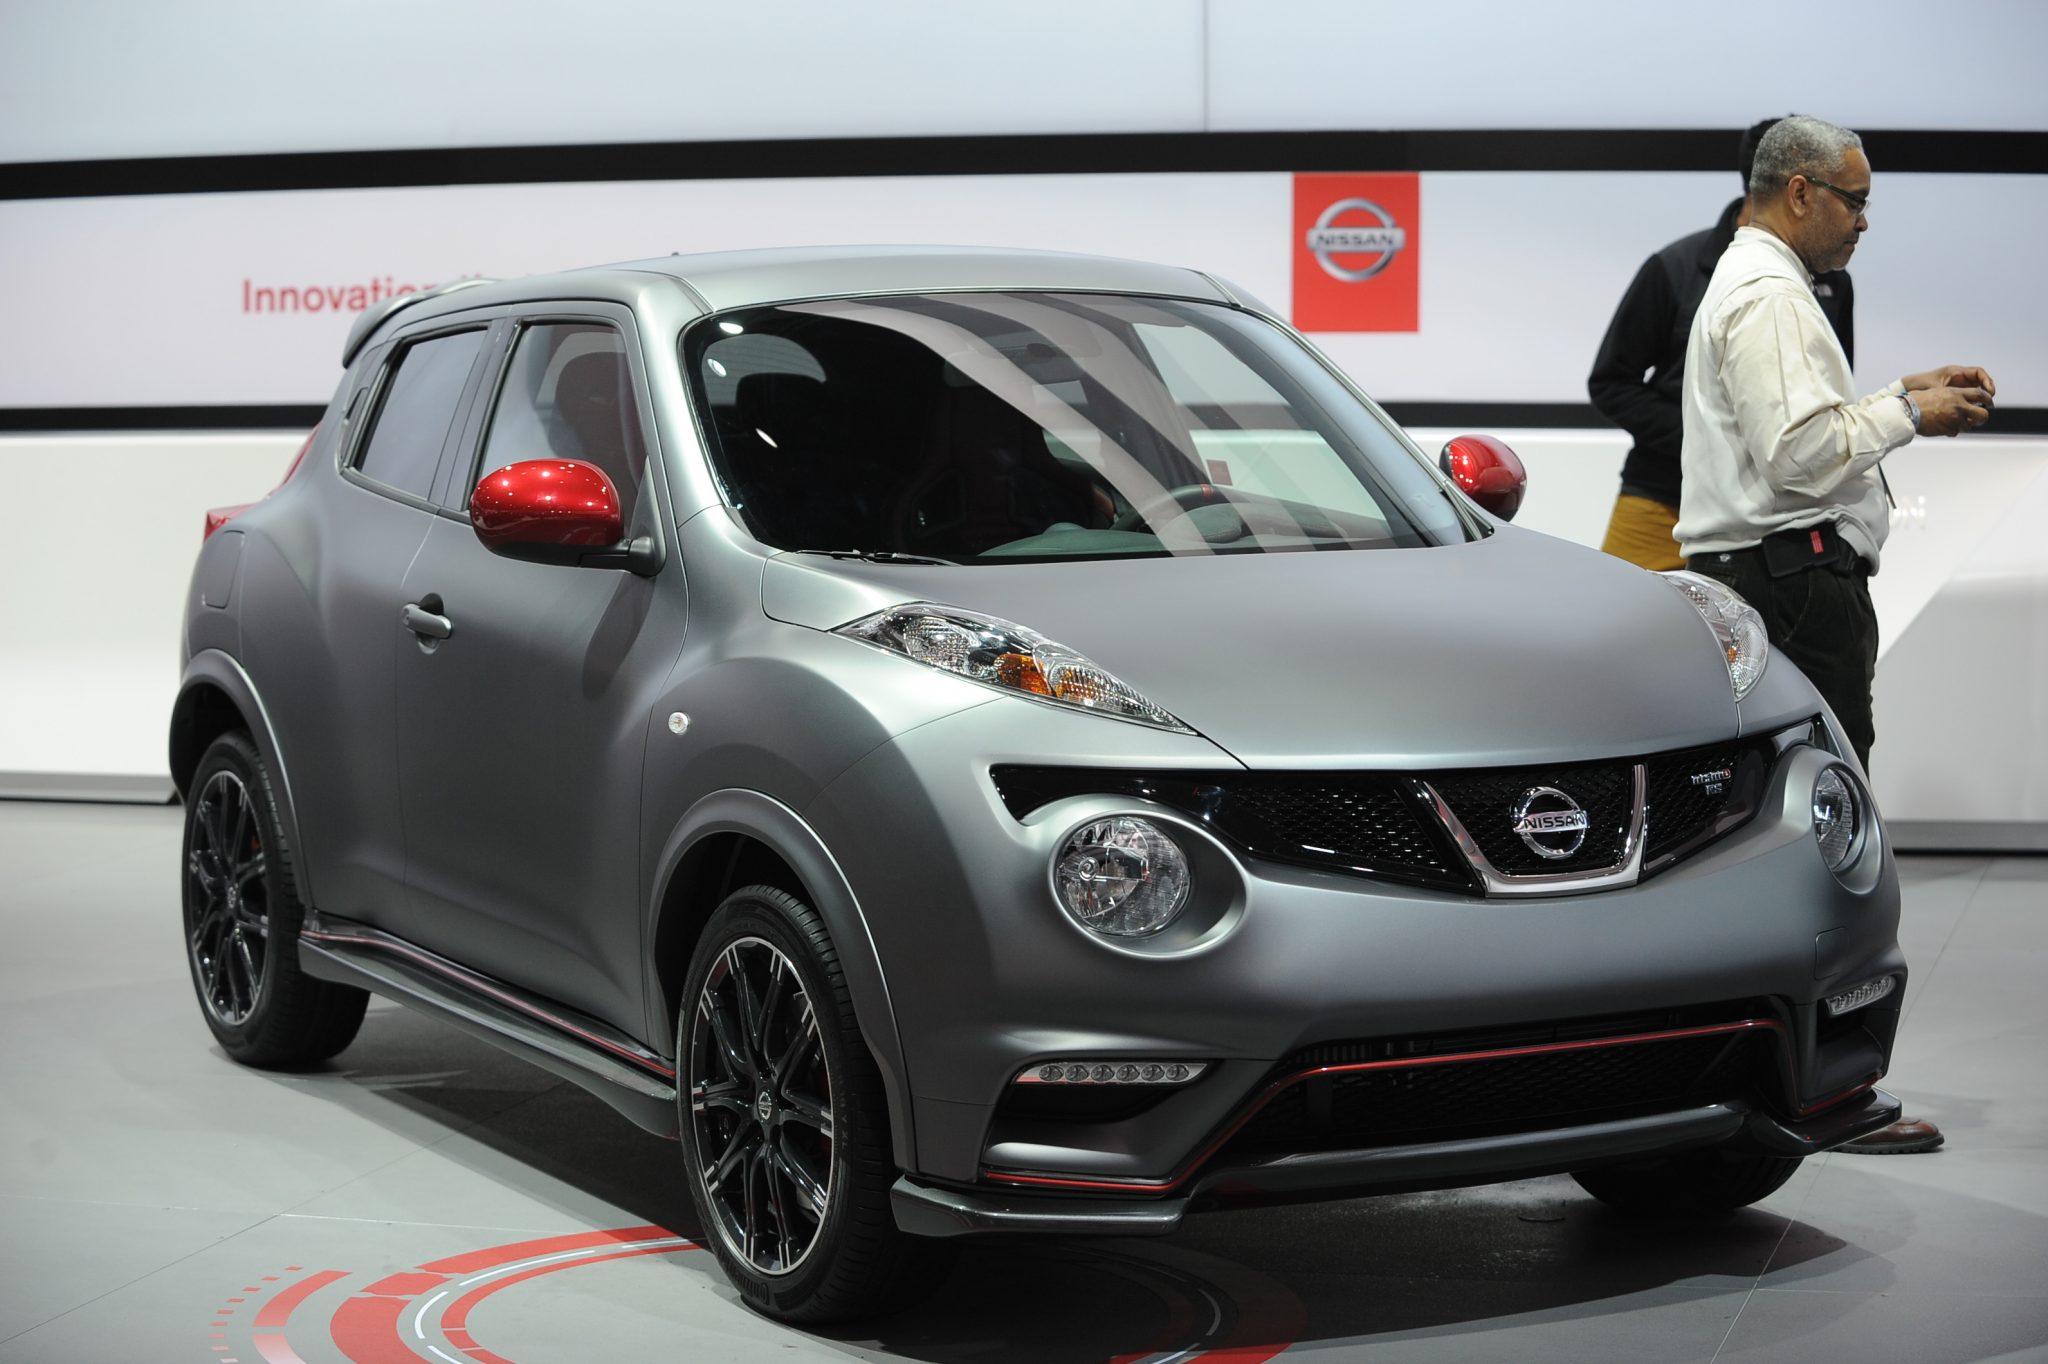 Nissan's May sales